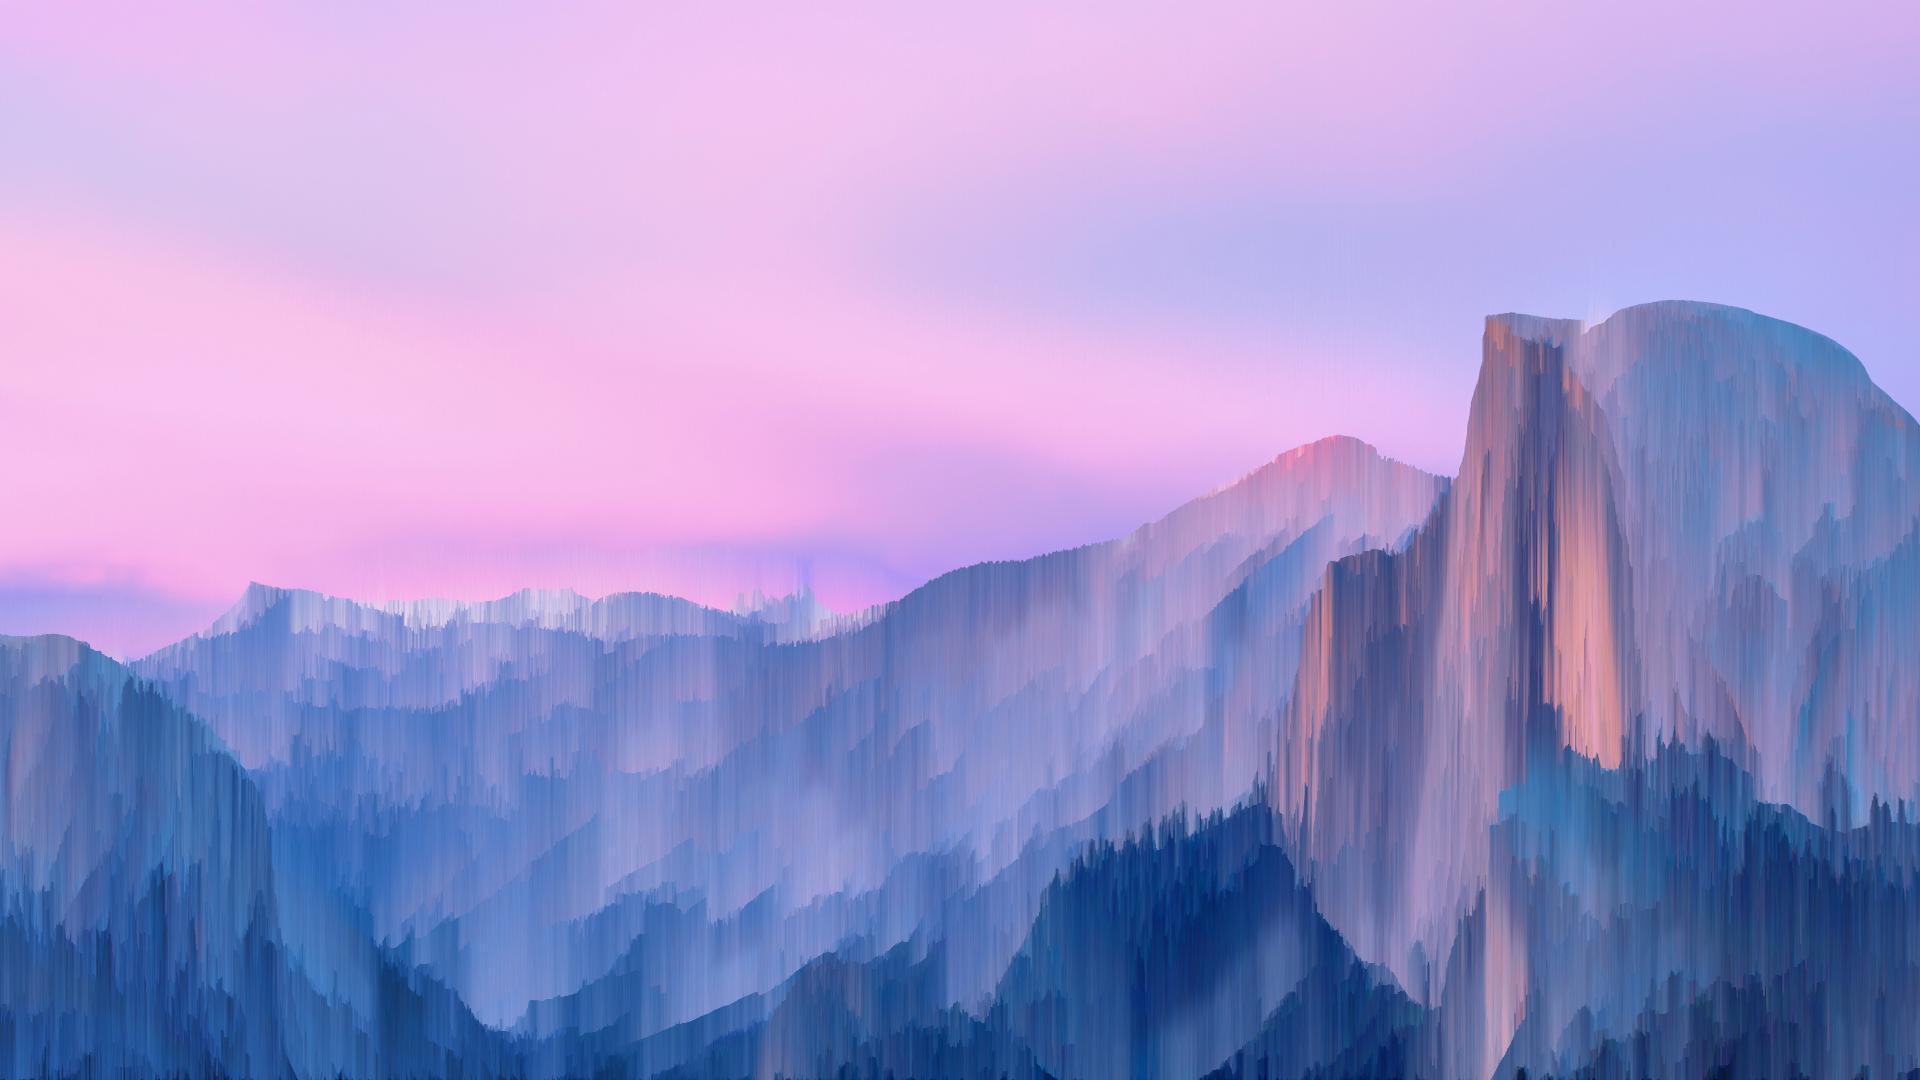 Google Pixel Wallpapers - Wallpaper Cave